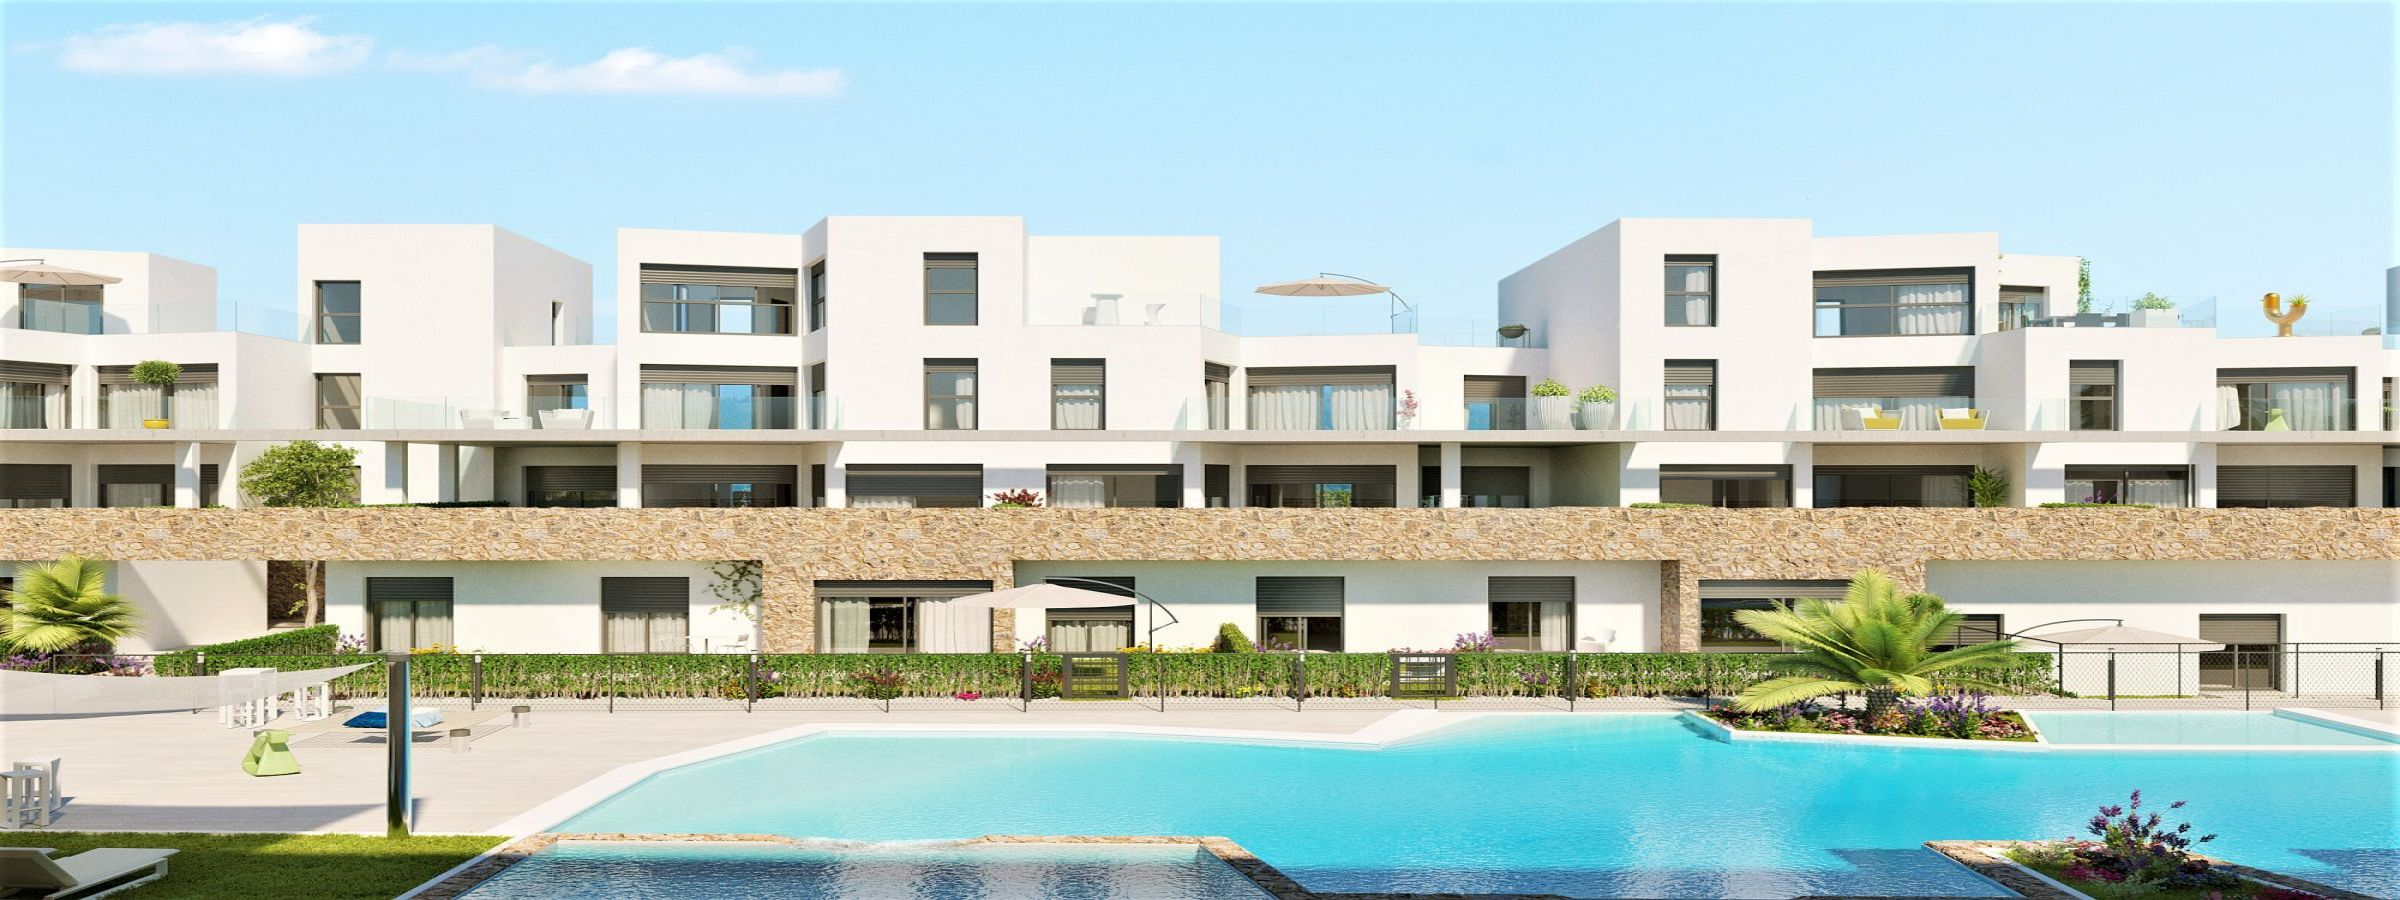 Immobilier Espagnol